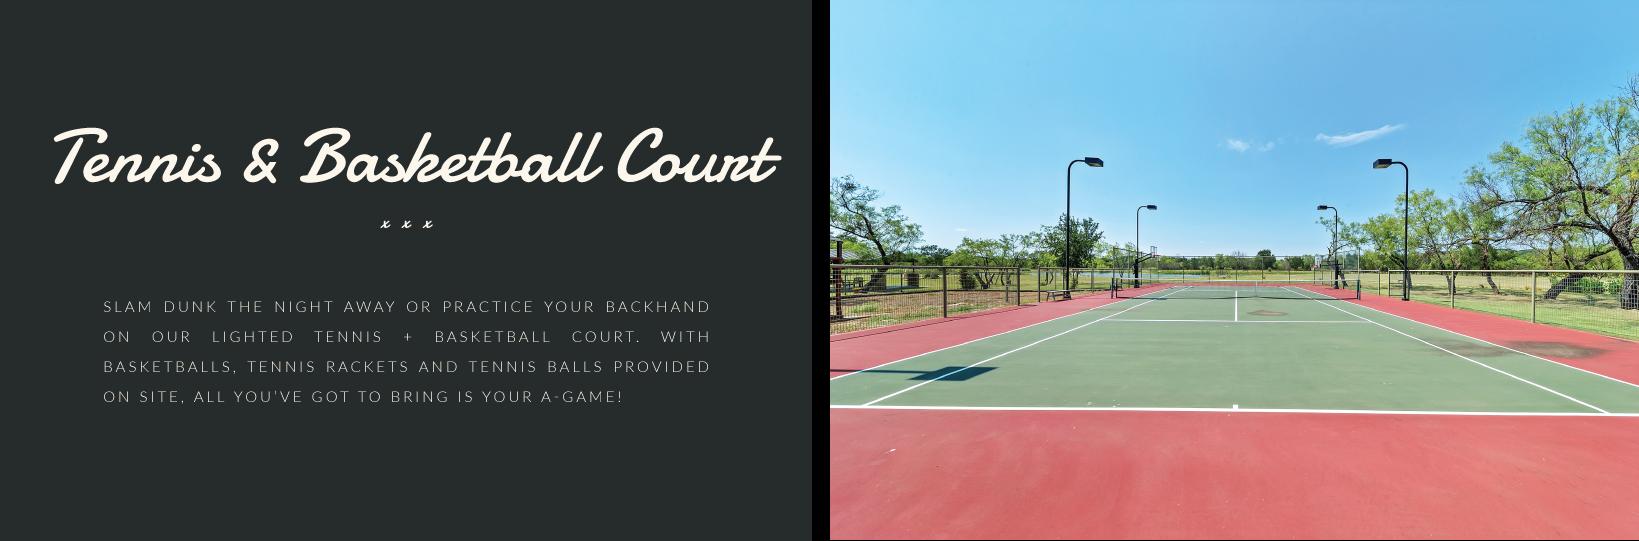 Tennis-Basketball-Court.png